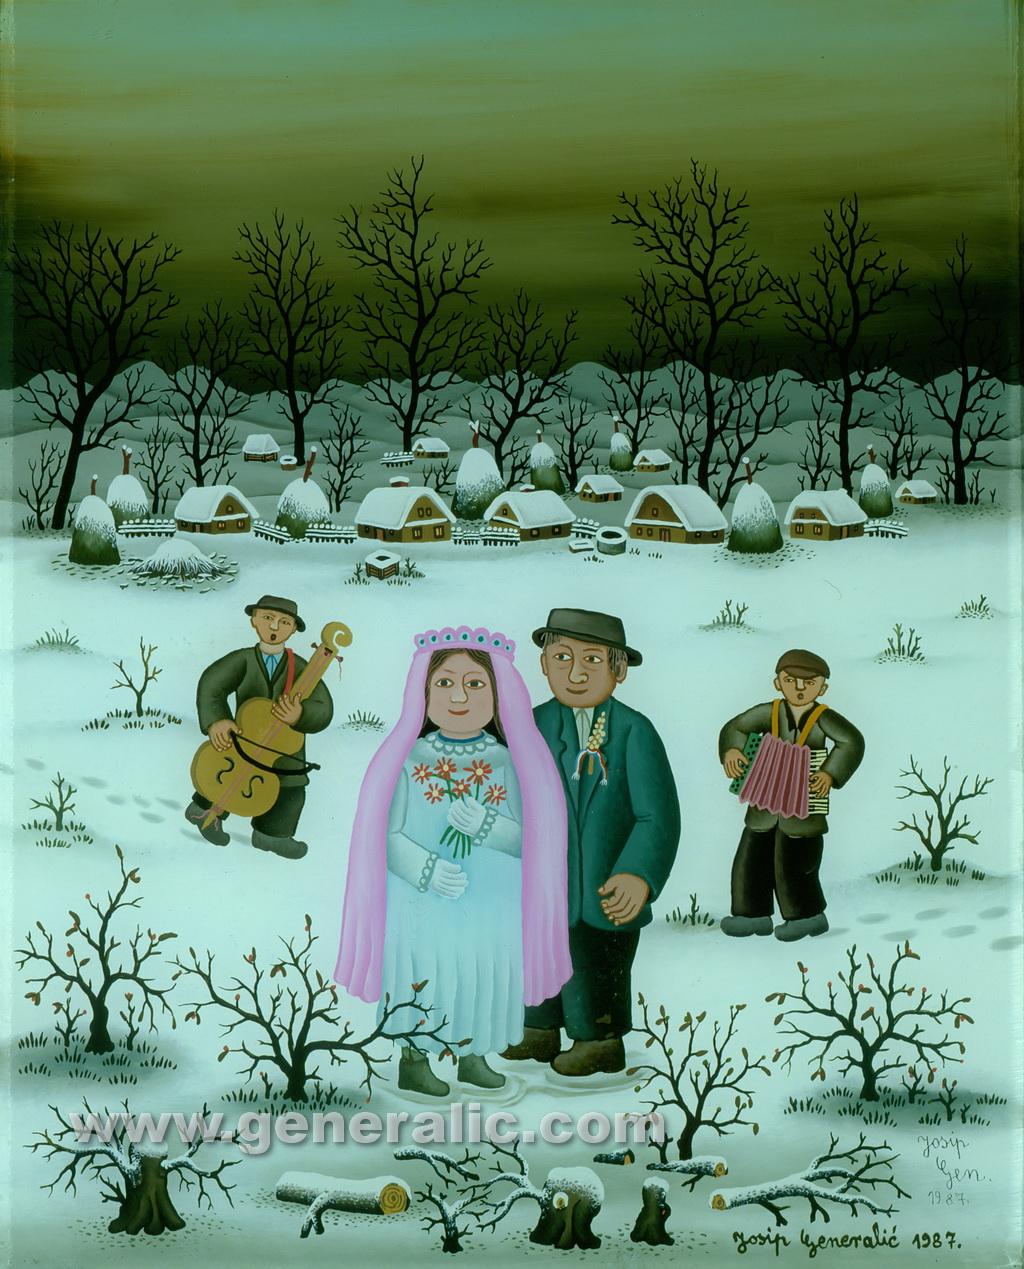 Josip Generalic, 1987, Winter wedding, oil on glass